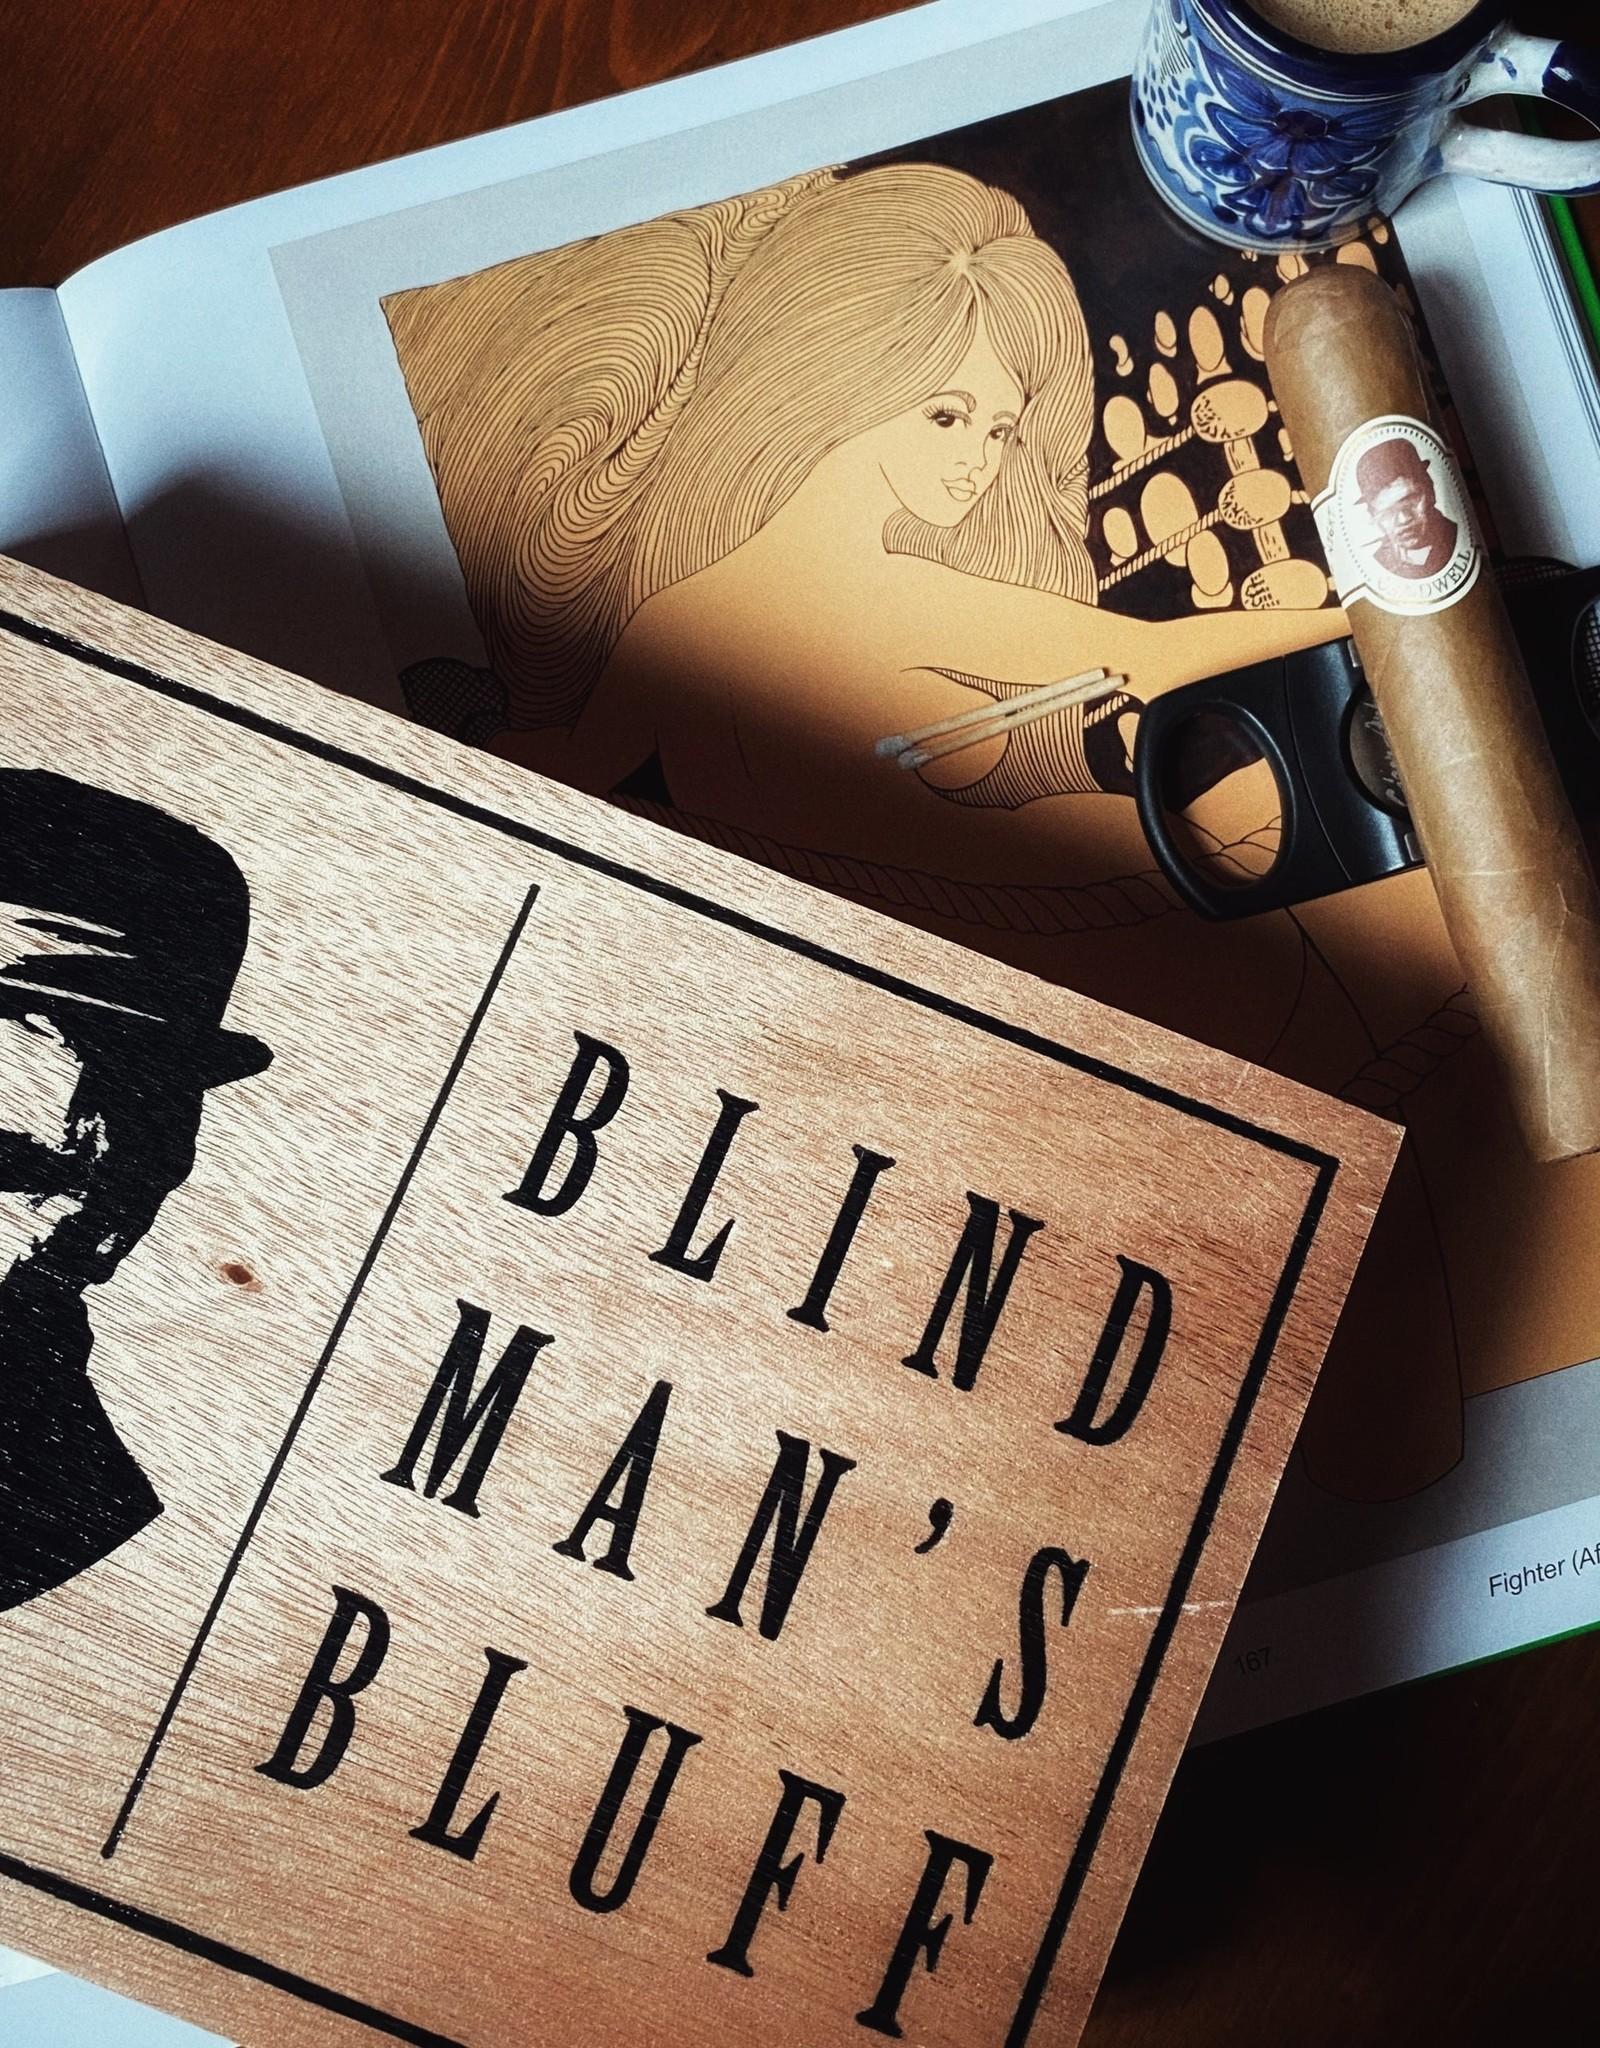 Caldwell Cigar Co Caldwell Blind Man's Bluff Connecticut 6 x 60 Single